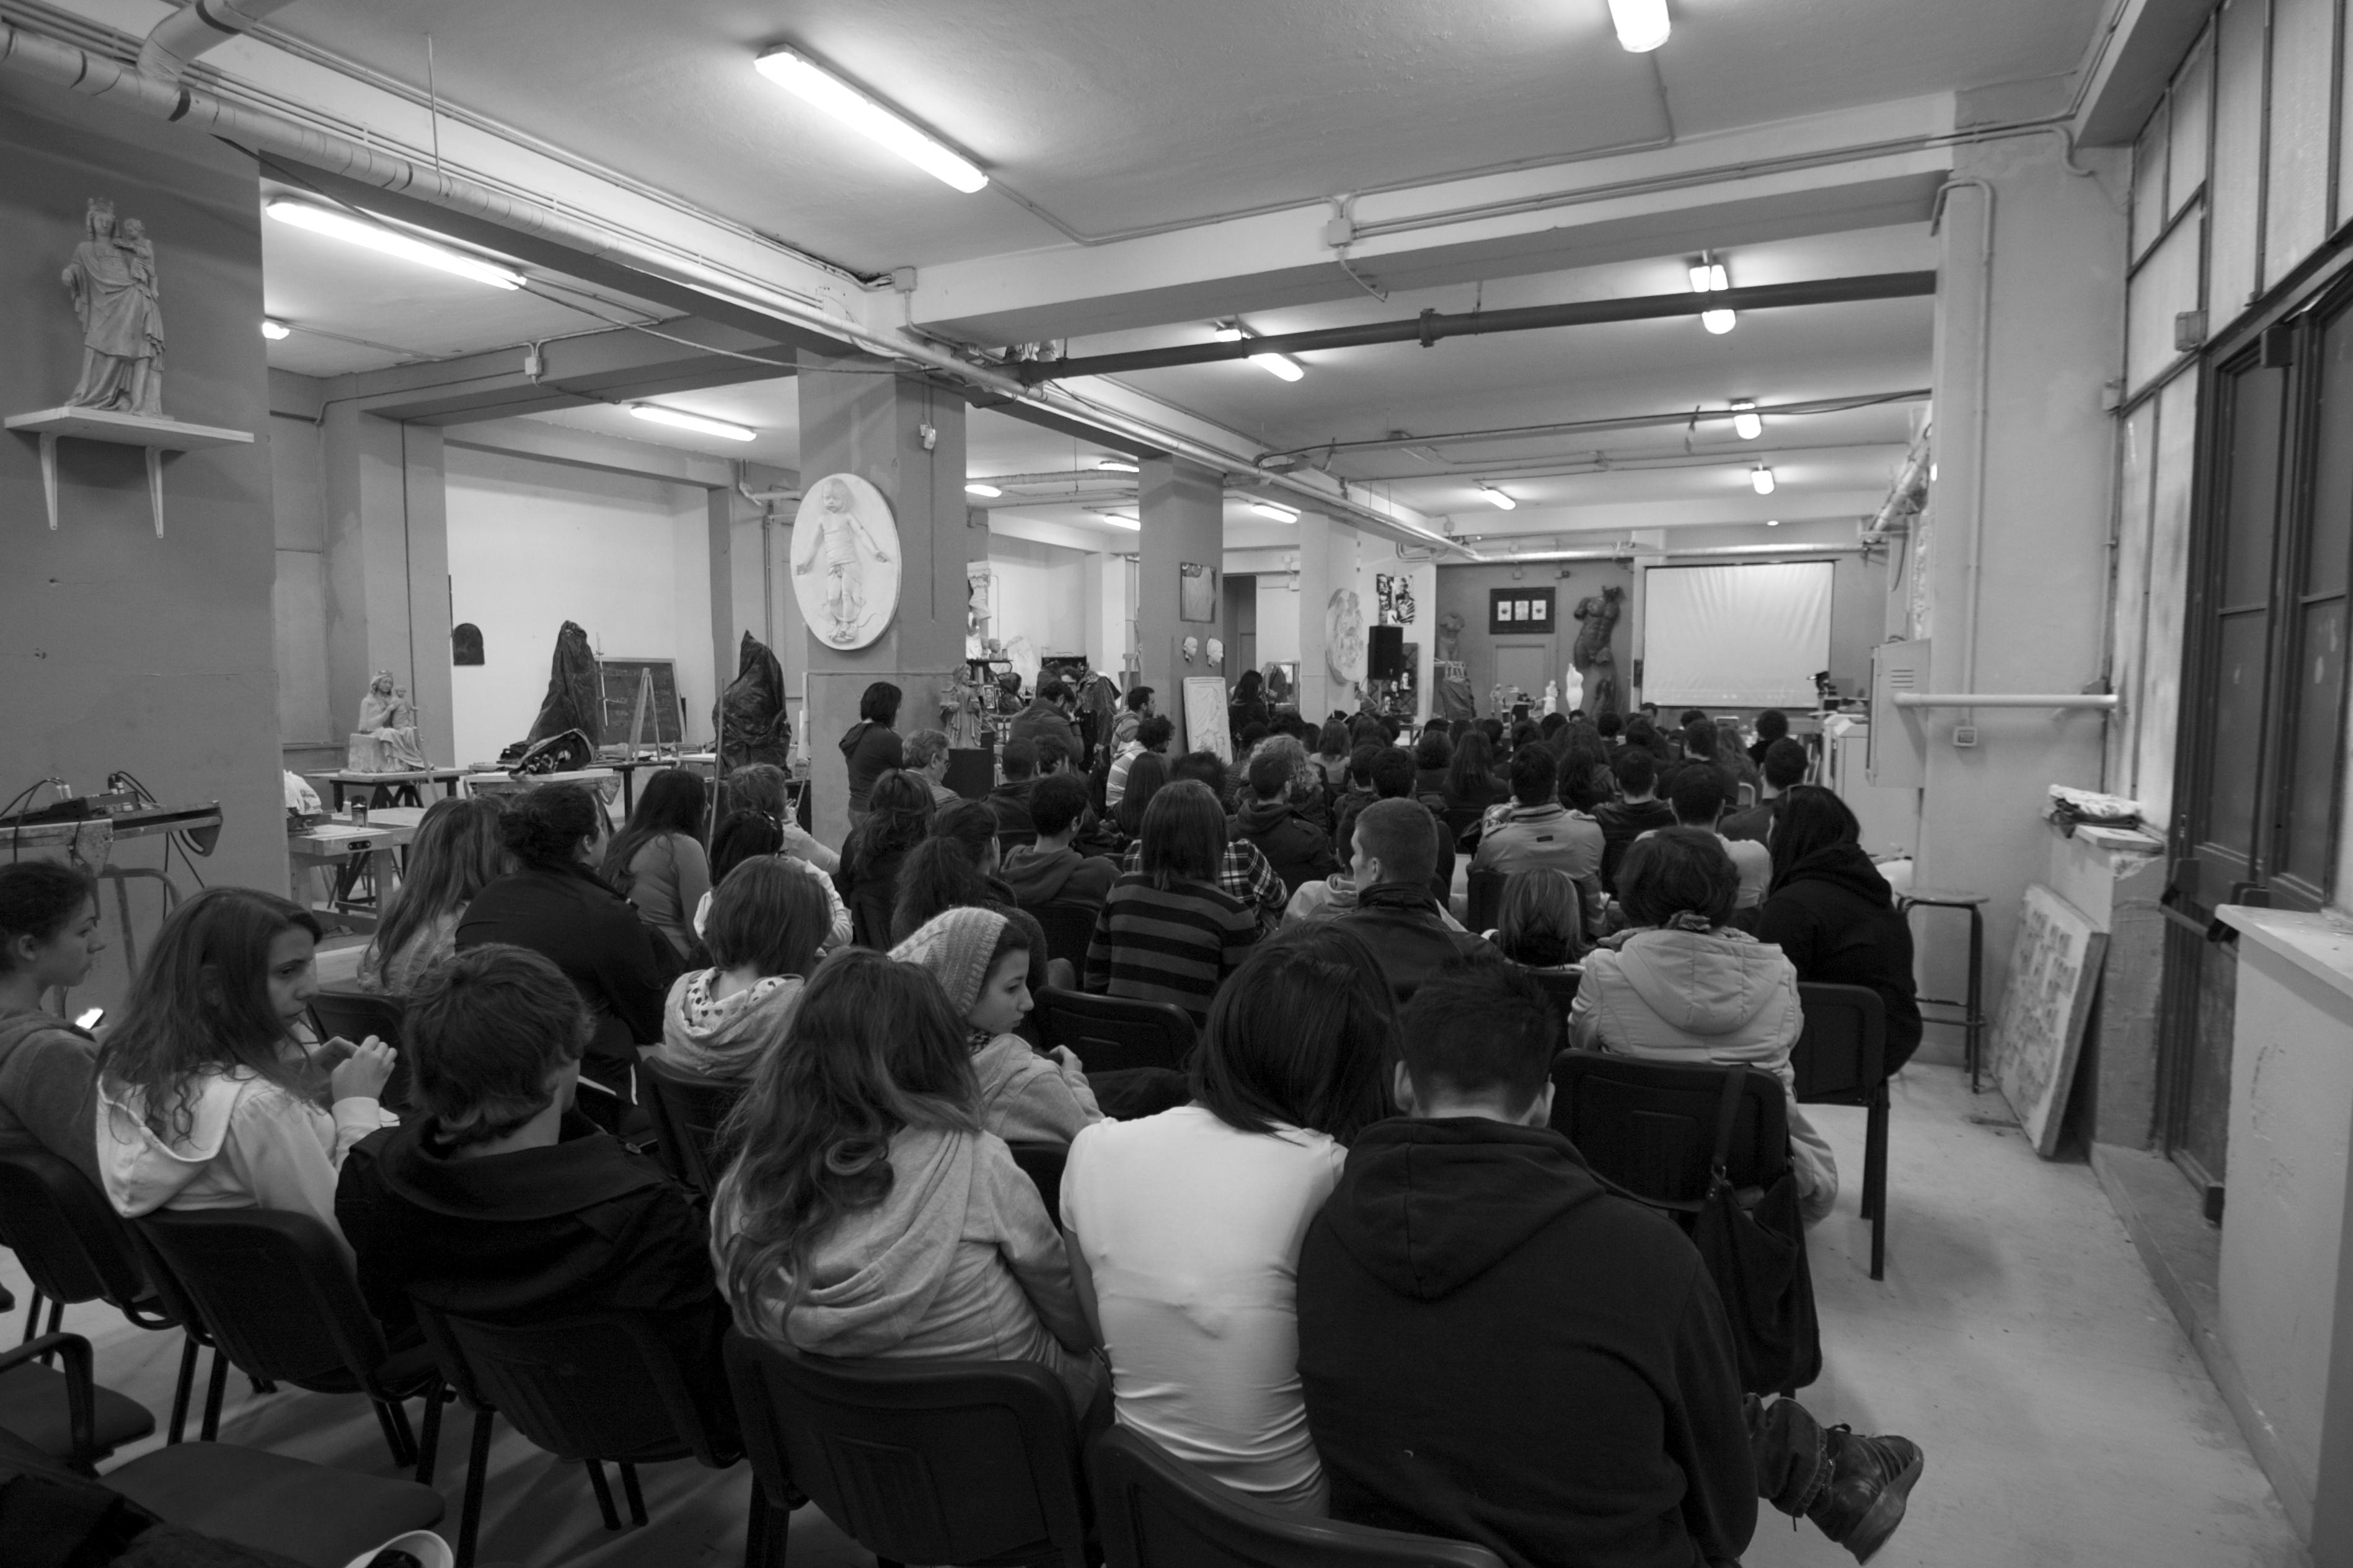 Flickr - Aron Demetz - Dialoghi e materia - Workshop a cura di Franco Reina04